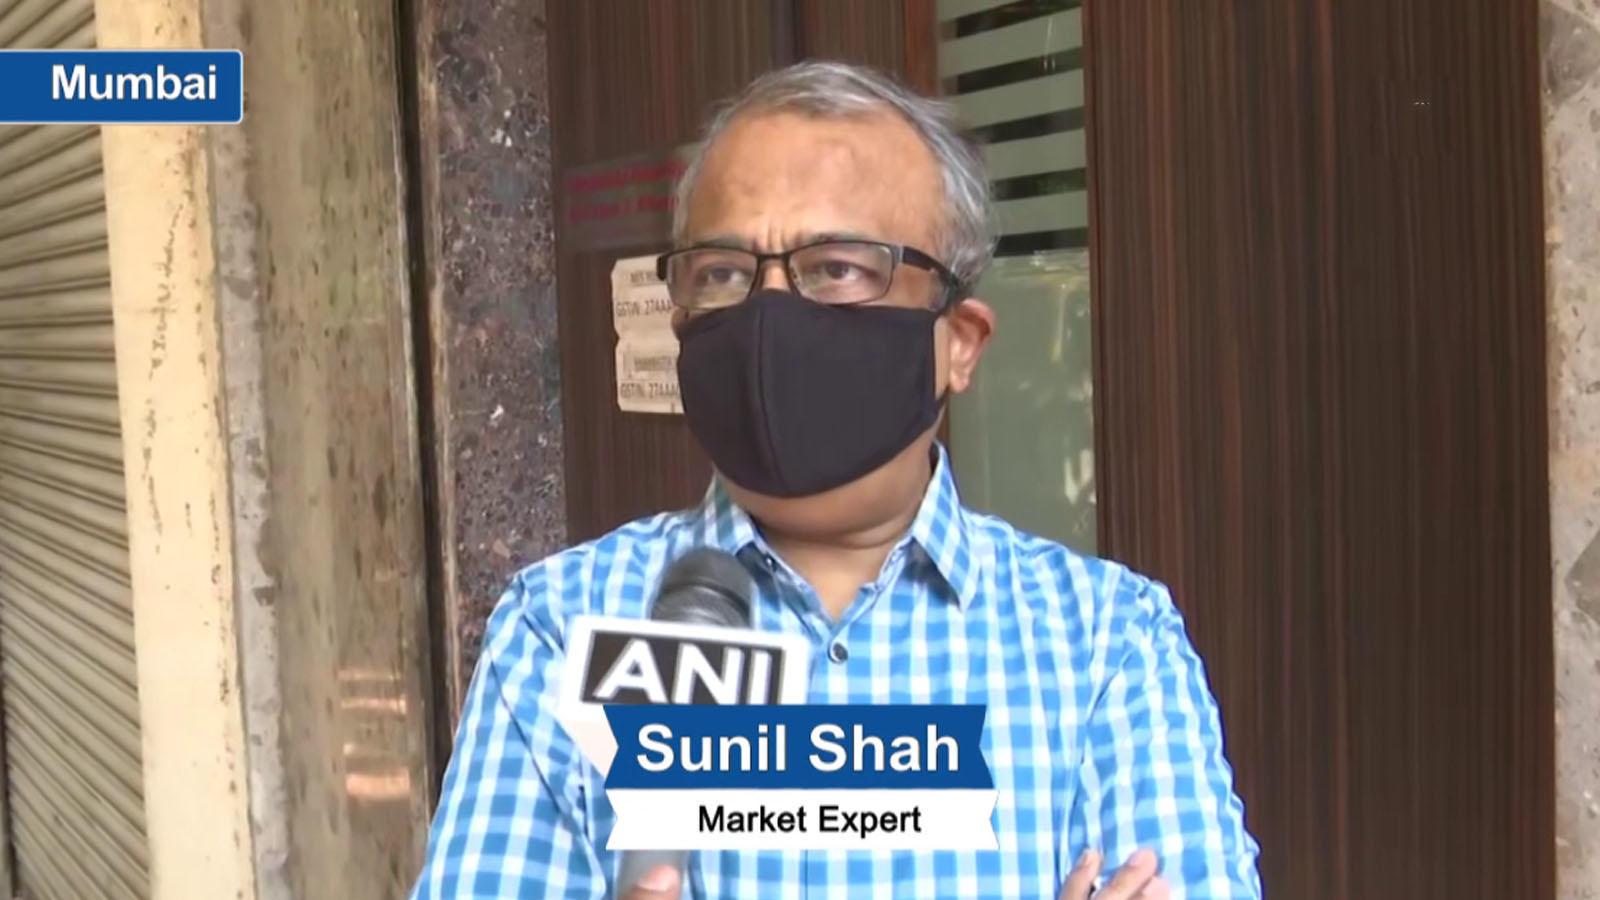 huge-liquidity-covid-19-vaccine-hopes-put-sensex-in-positive-zone-market-expert